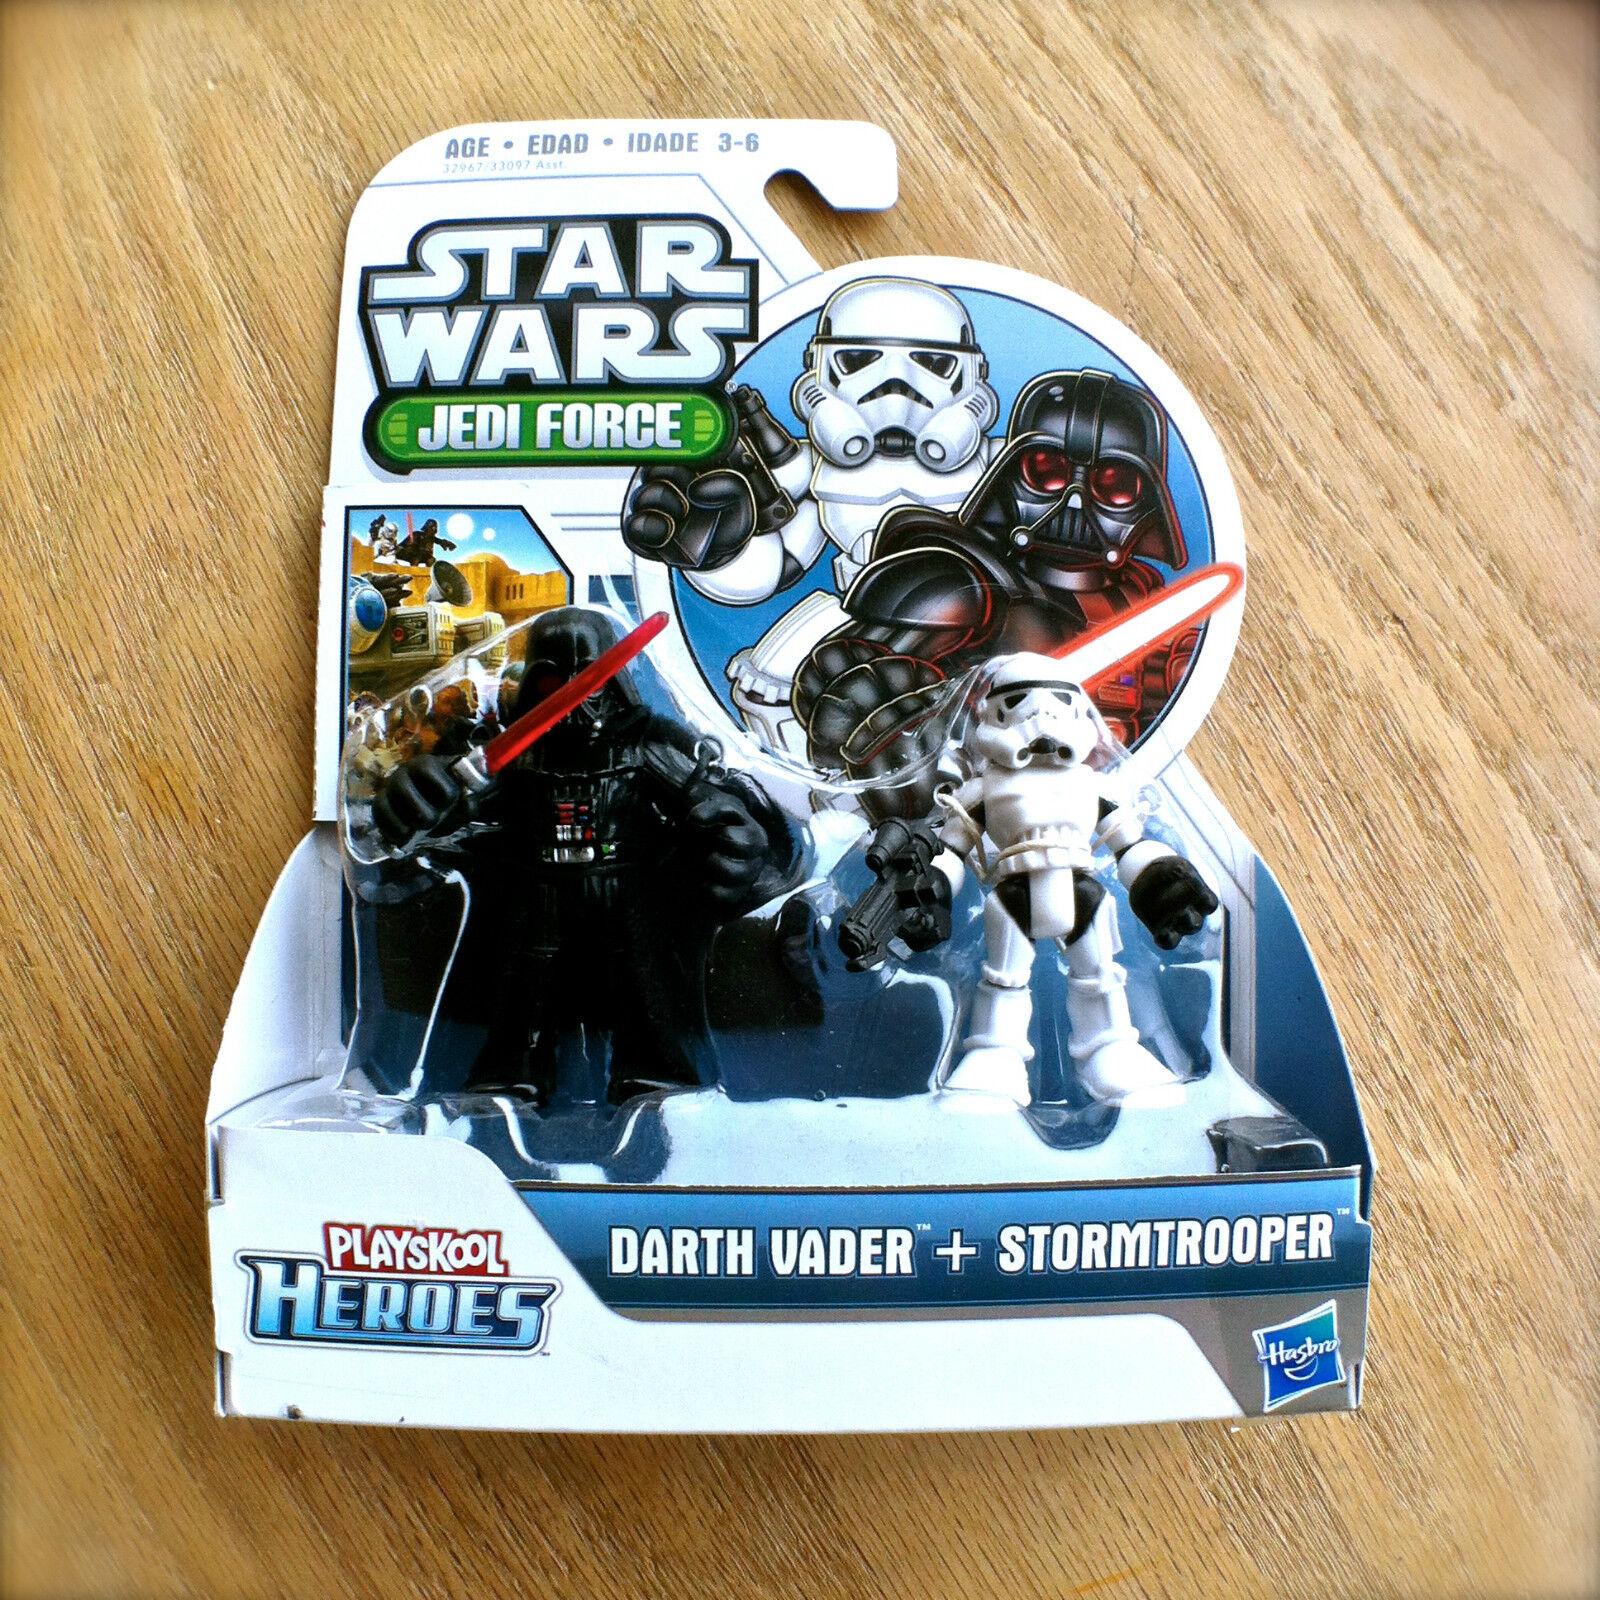 STAR WARS Jedi Force DARTH VADER STORMTROOPER Playskool Heroes HASBRO Droid 2pk